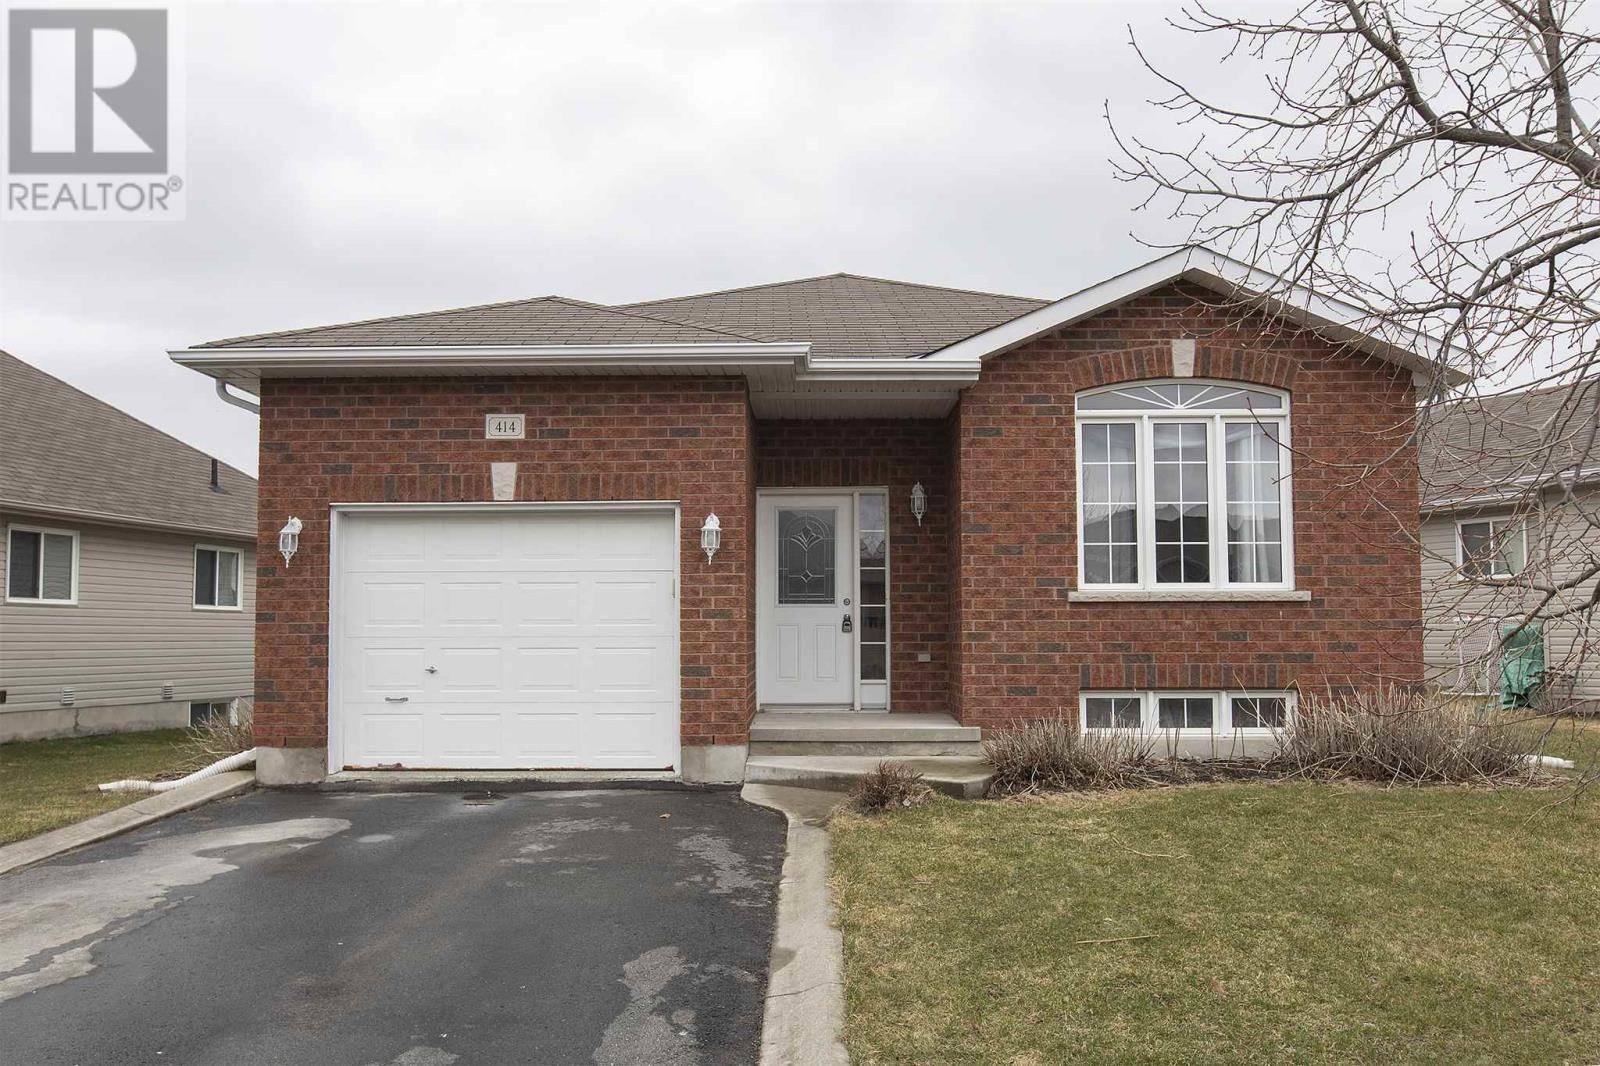 House for sale at 414 Abbot St Kingston Ontario - MLS: K20001751